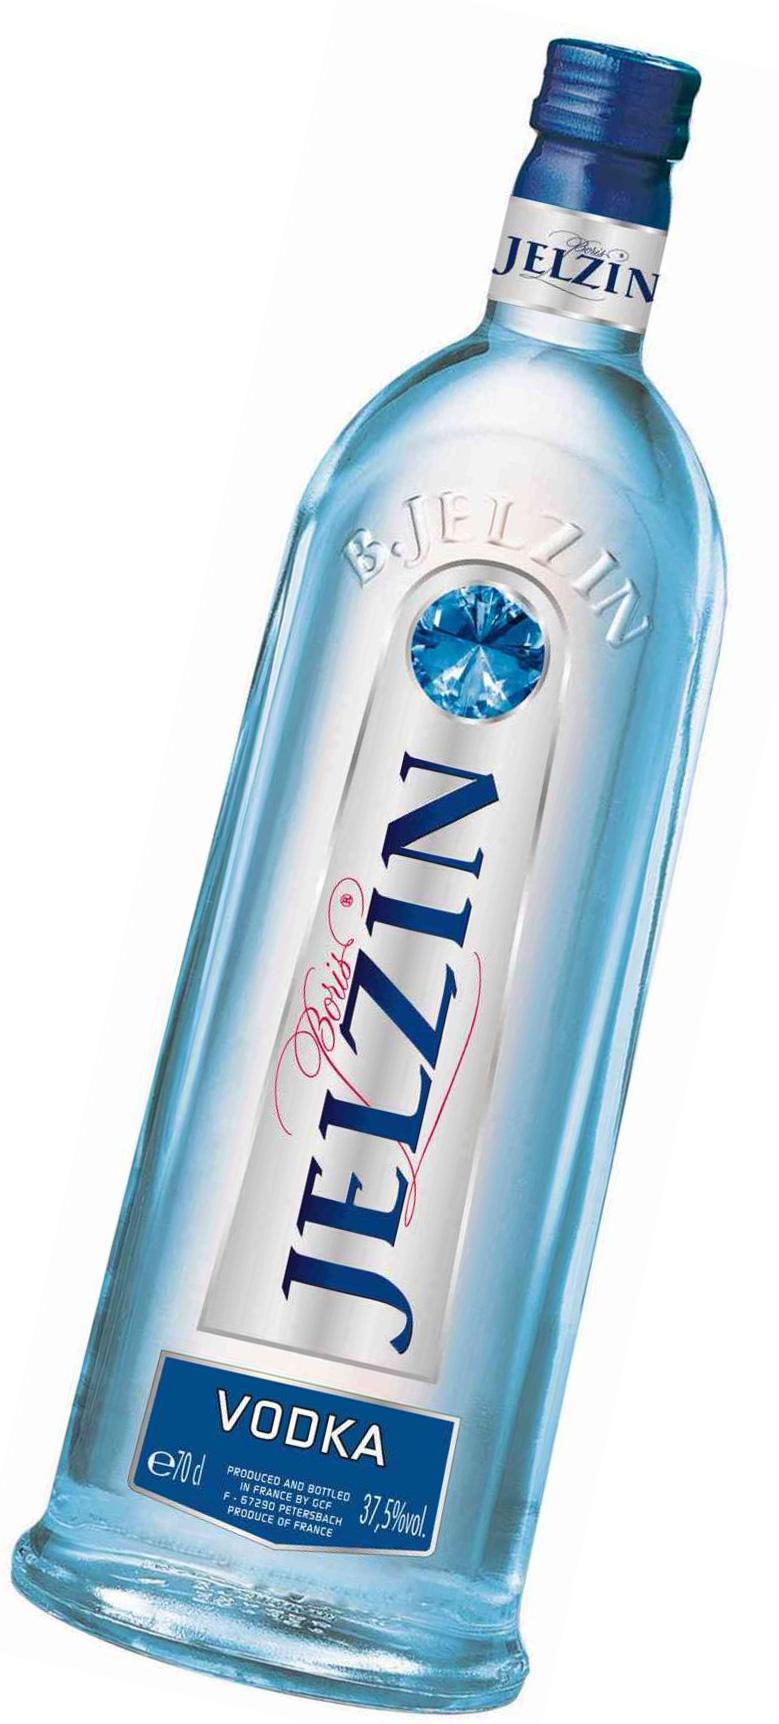 Historien om Vodka Boris Jelzin